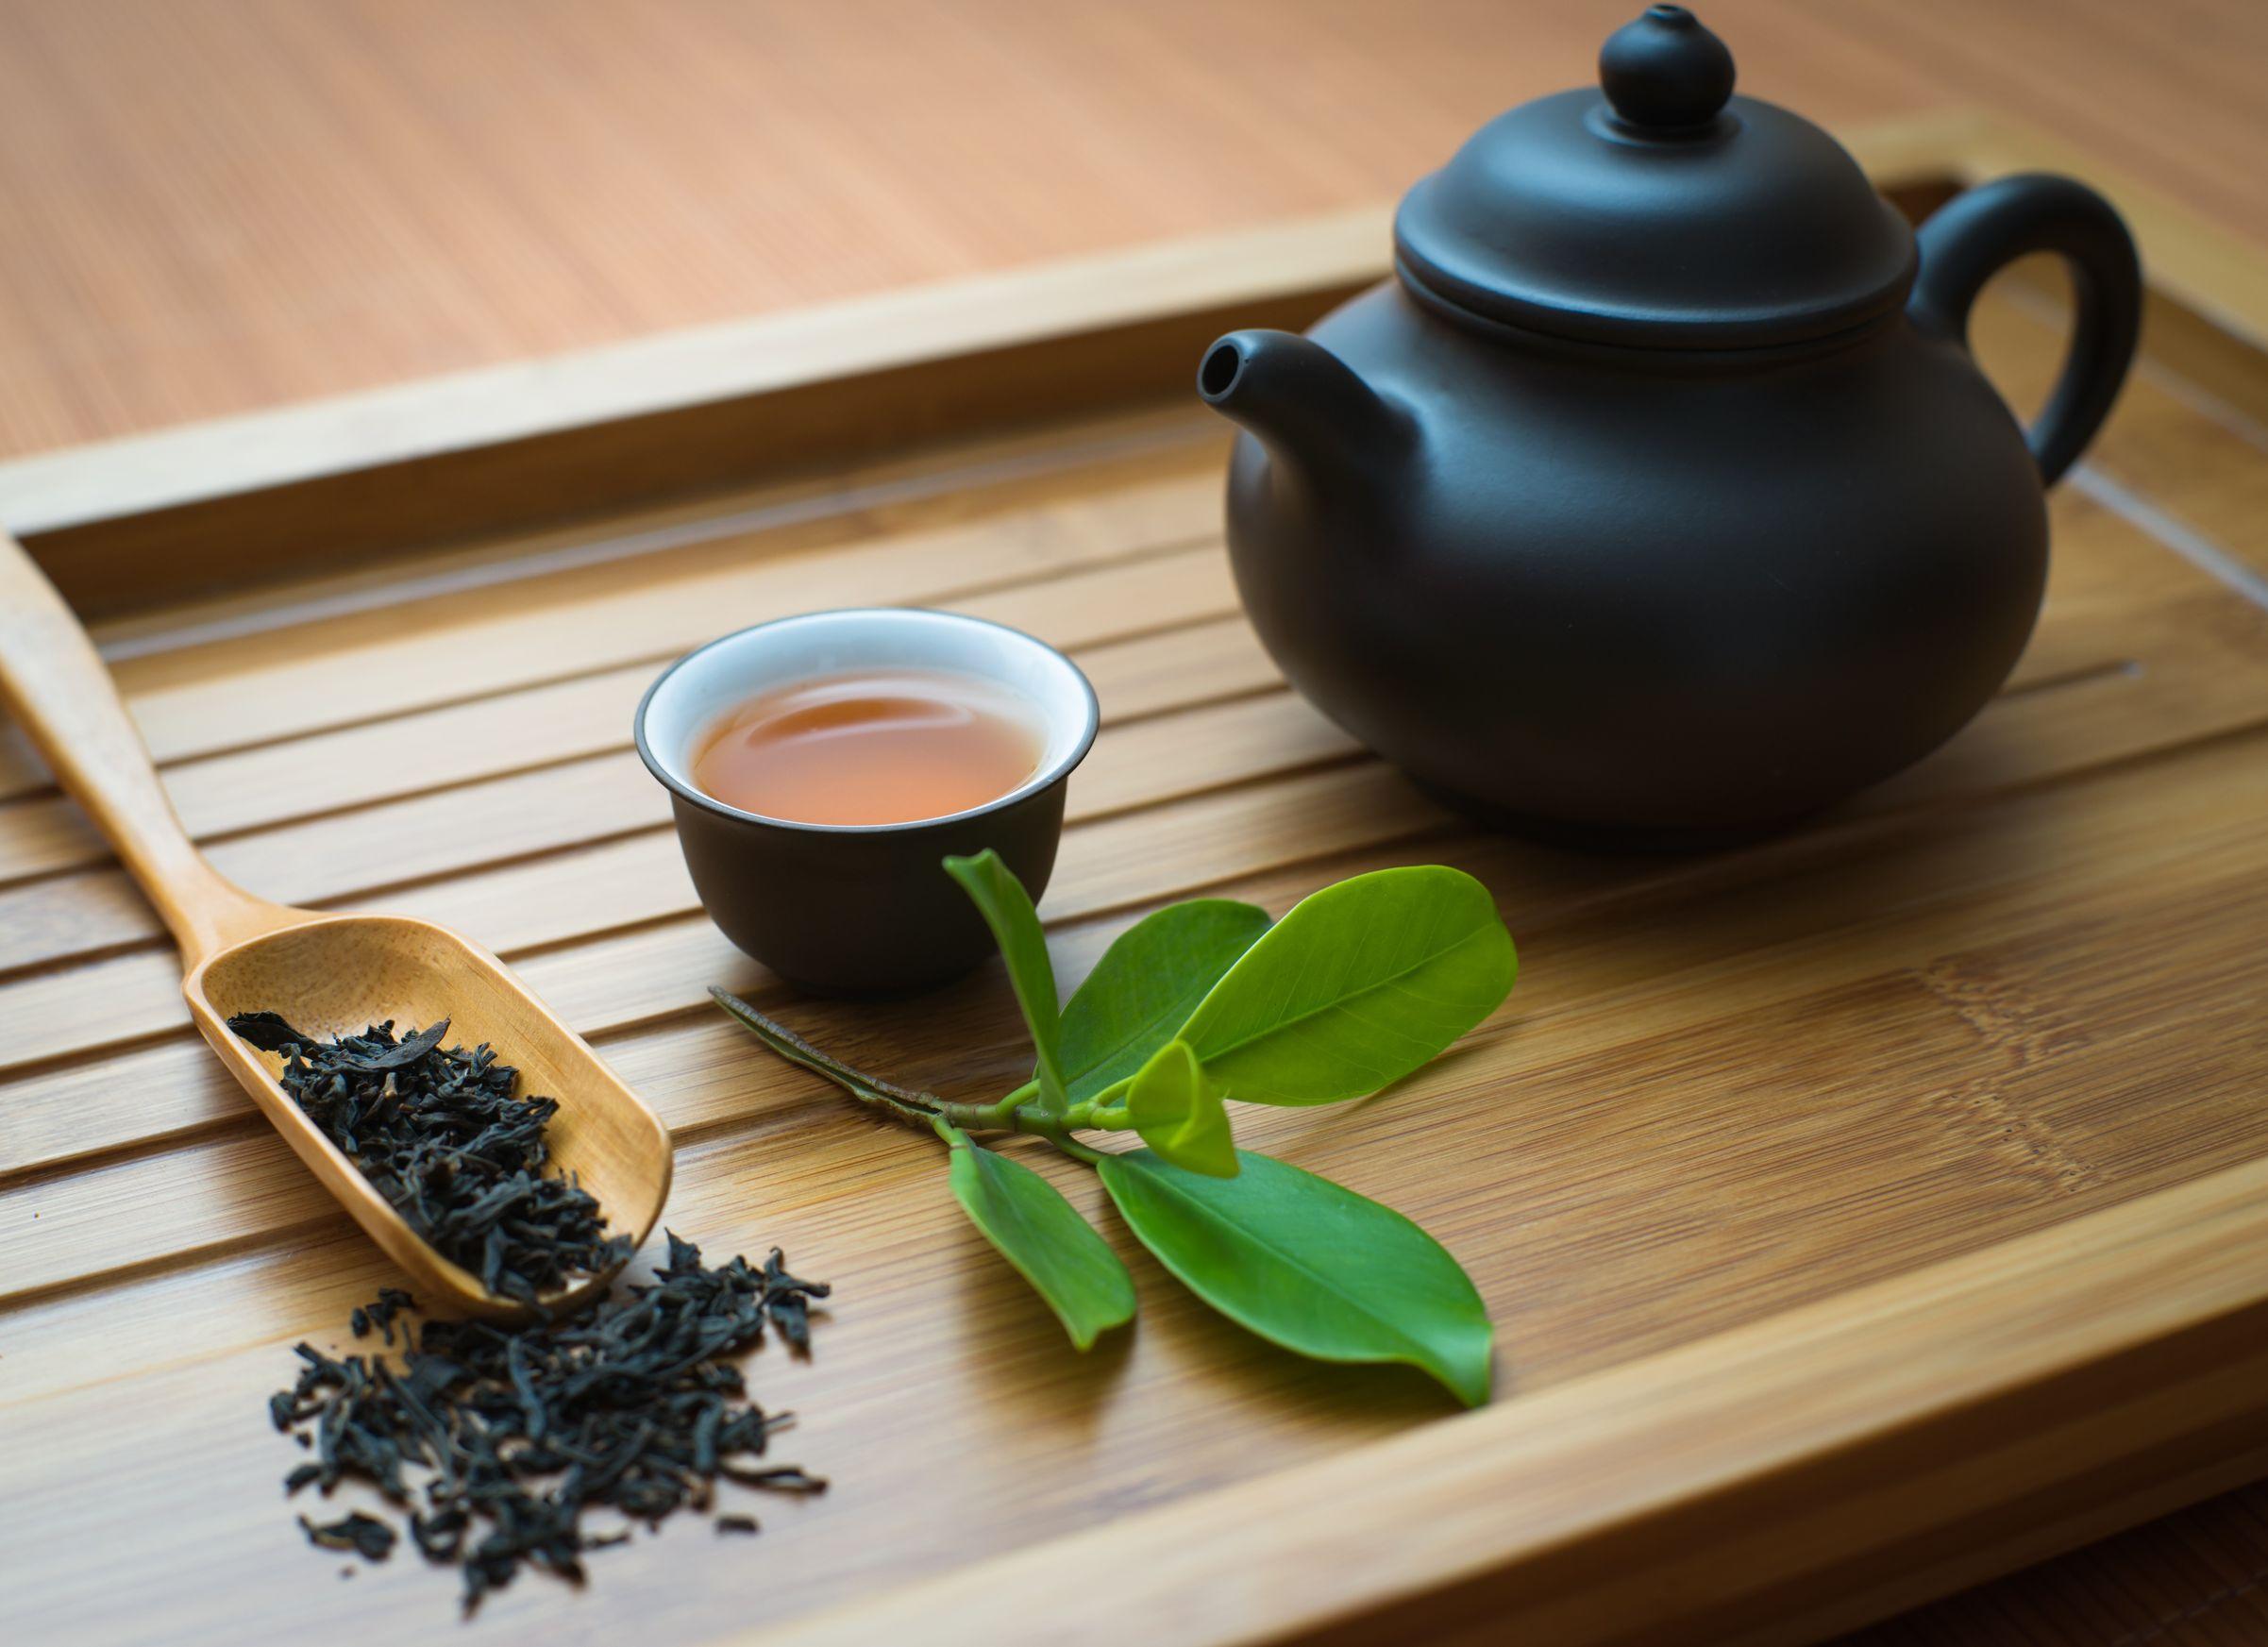 Картинка чай китайский